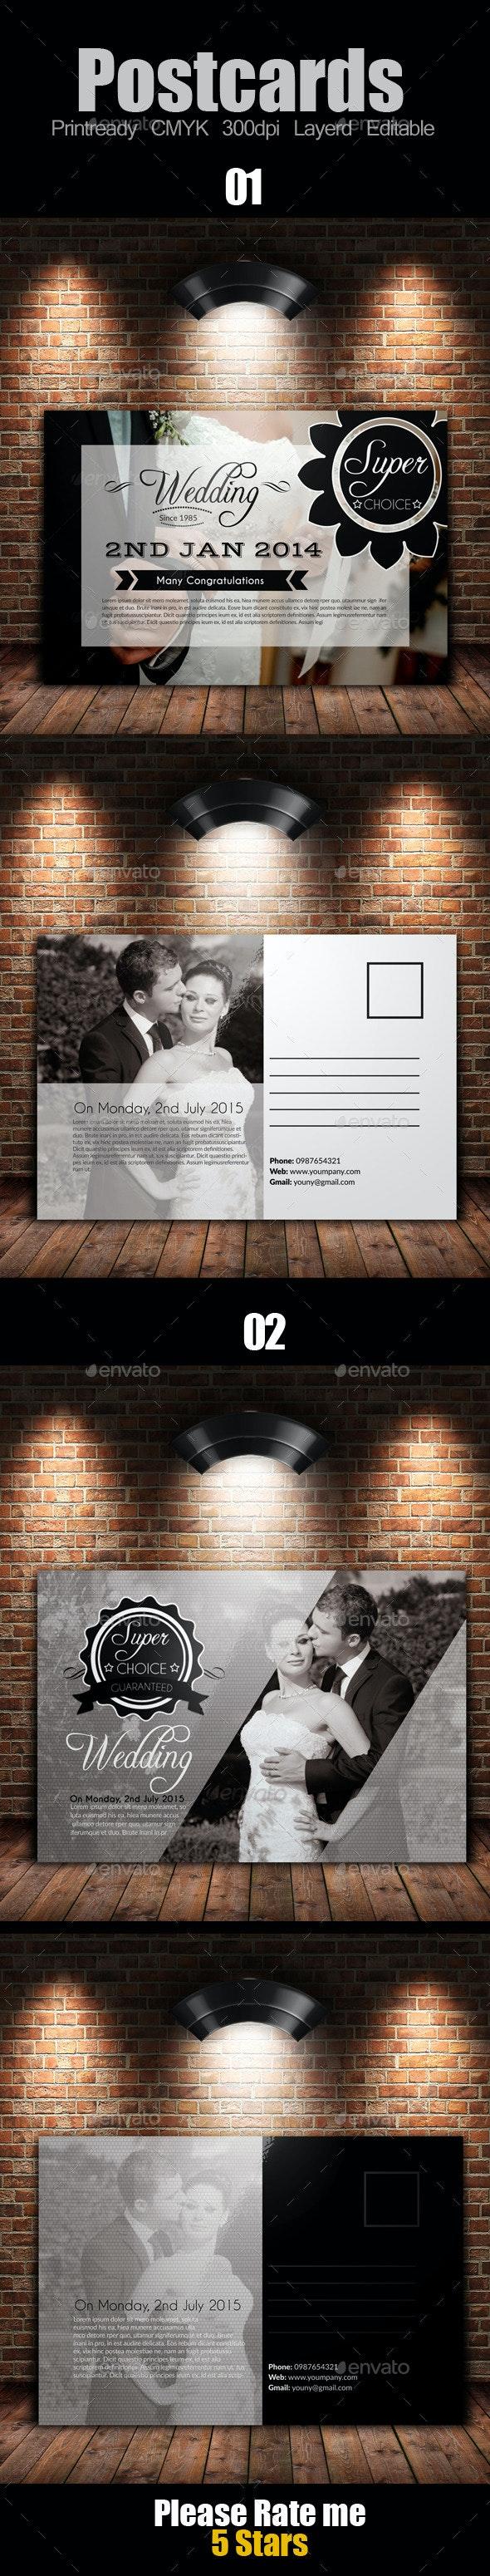 Wedding Invitation Post Card Bundle - Cards & Invites Print Templates